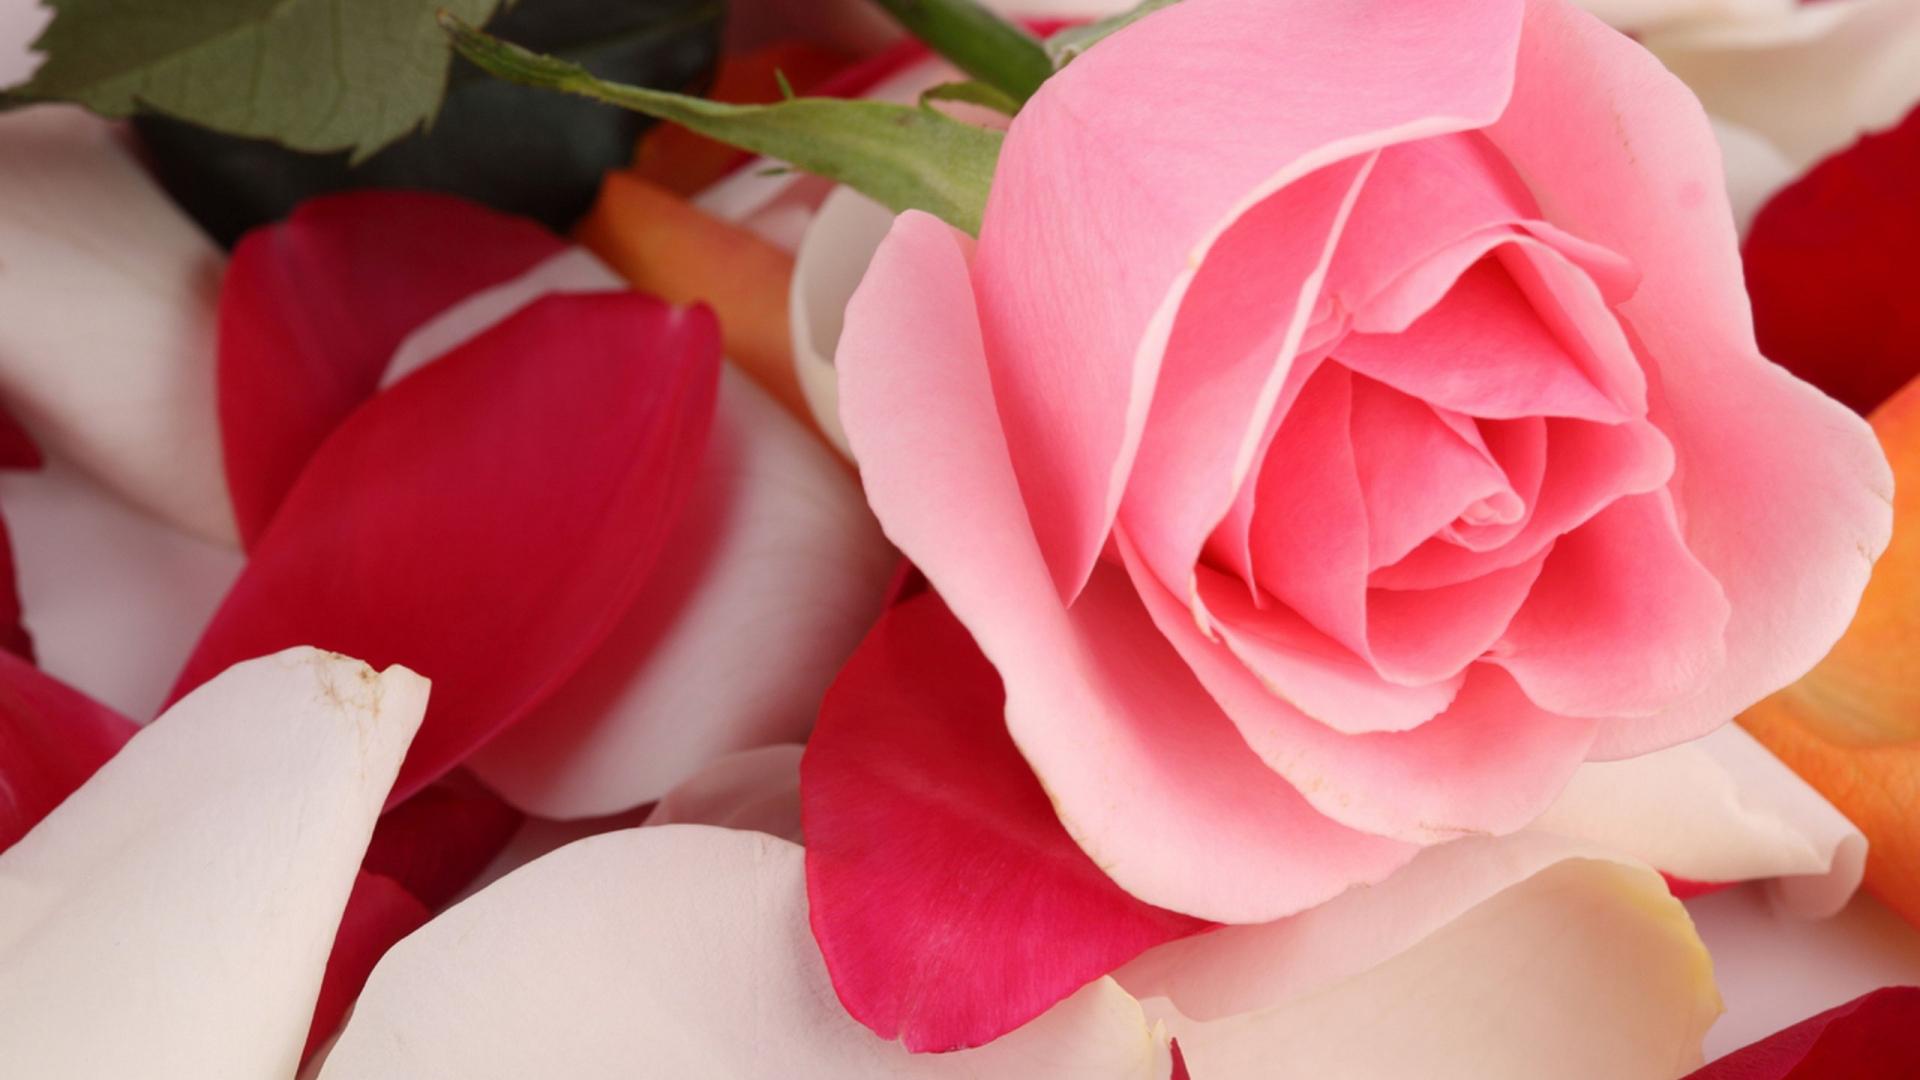 Download 1920x1080 wallpaper beautiful pink rose flower full hd 1920x1080 wallpaper beautiful pink rose flower izmirmasajfo